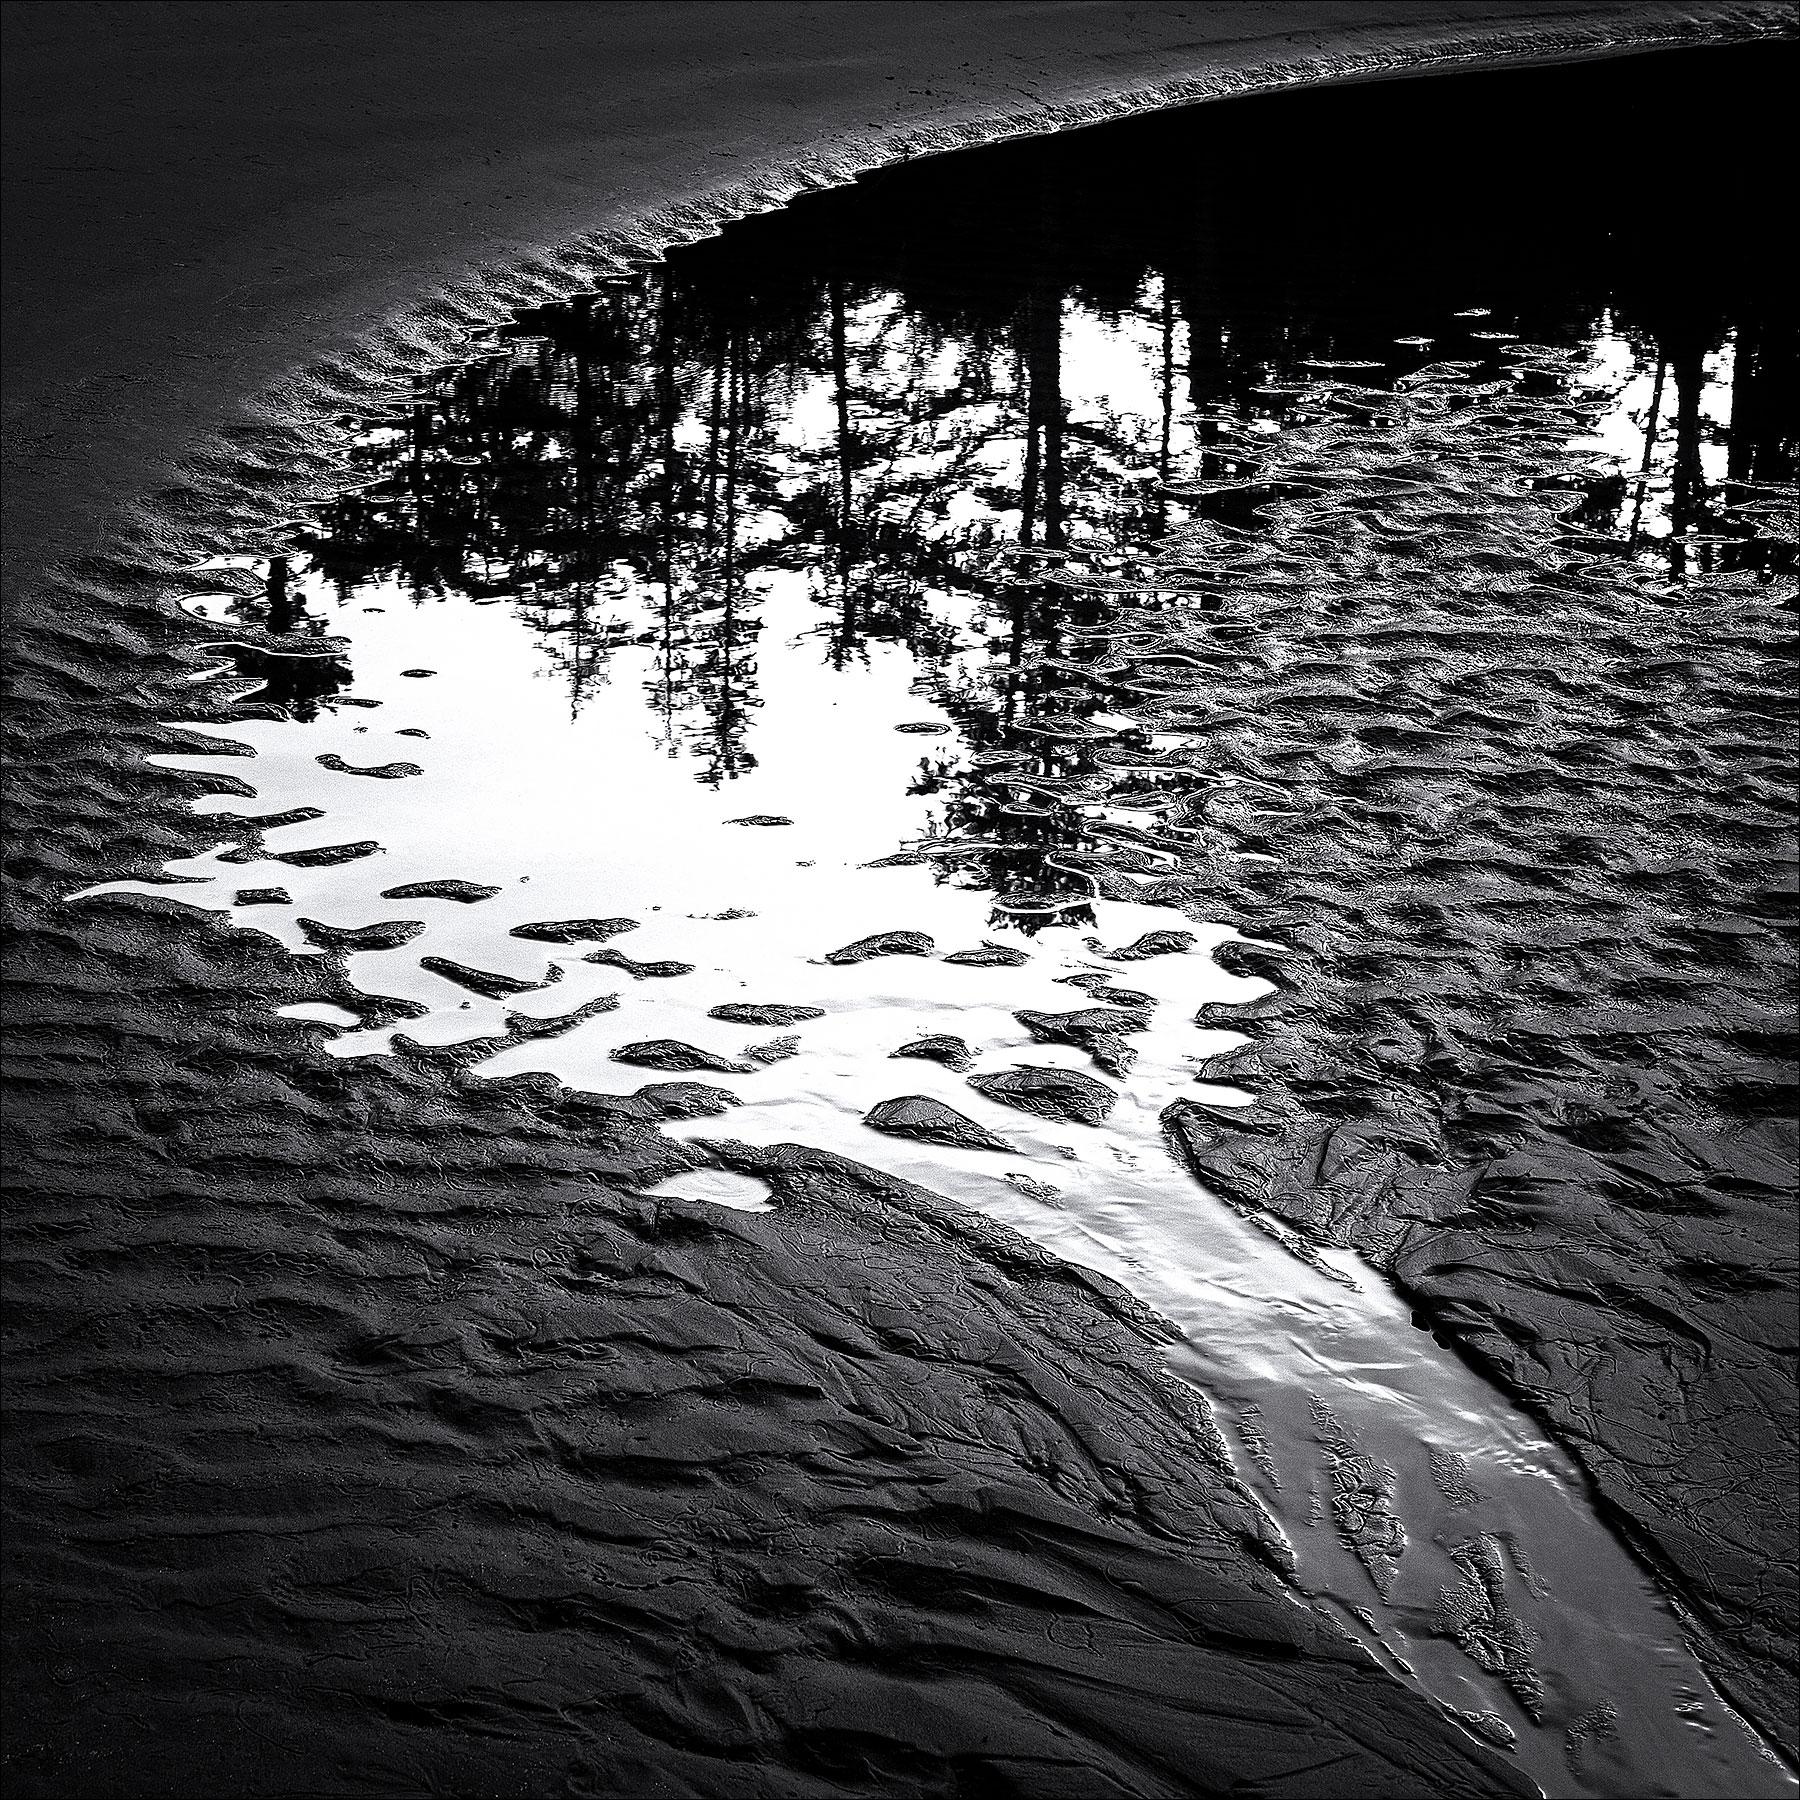 Sandscape ©johncameron.ca